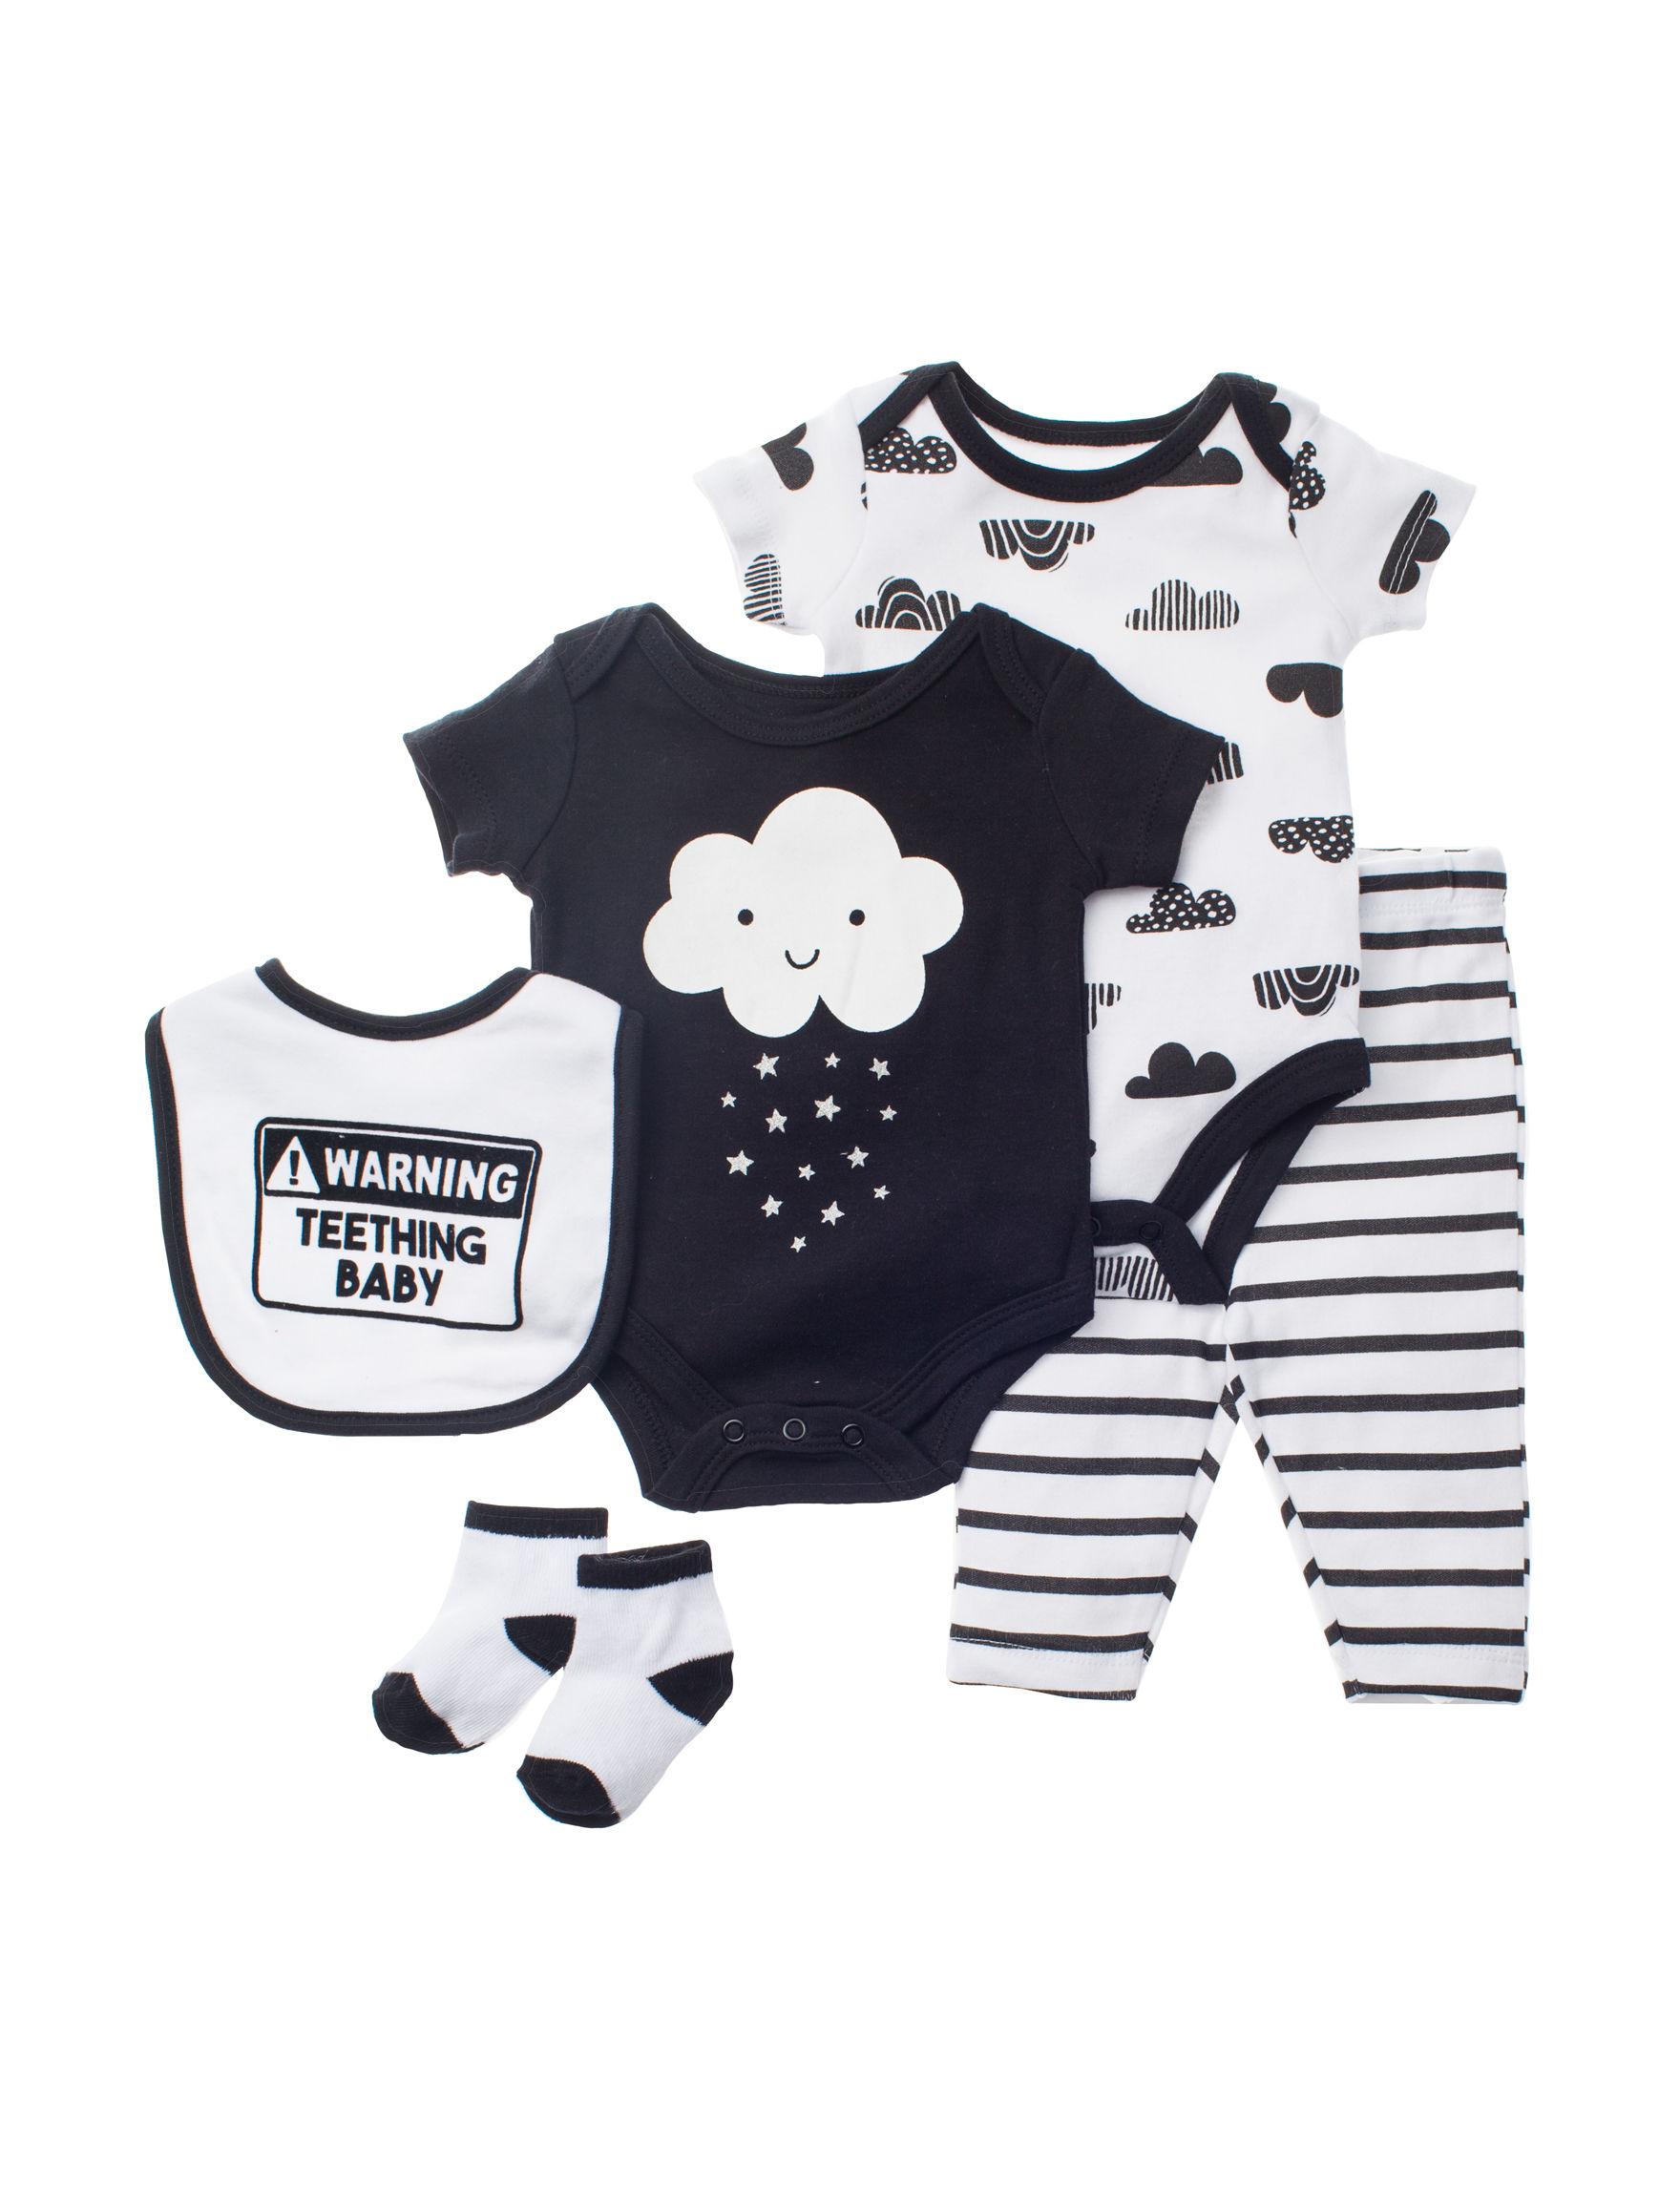 Baby Starters Black / White